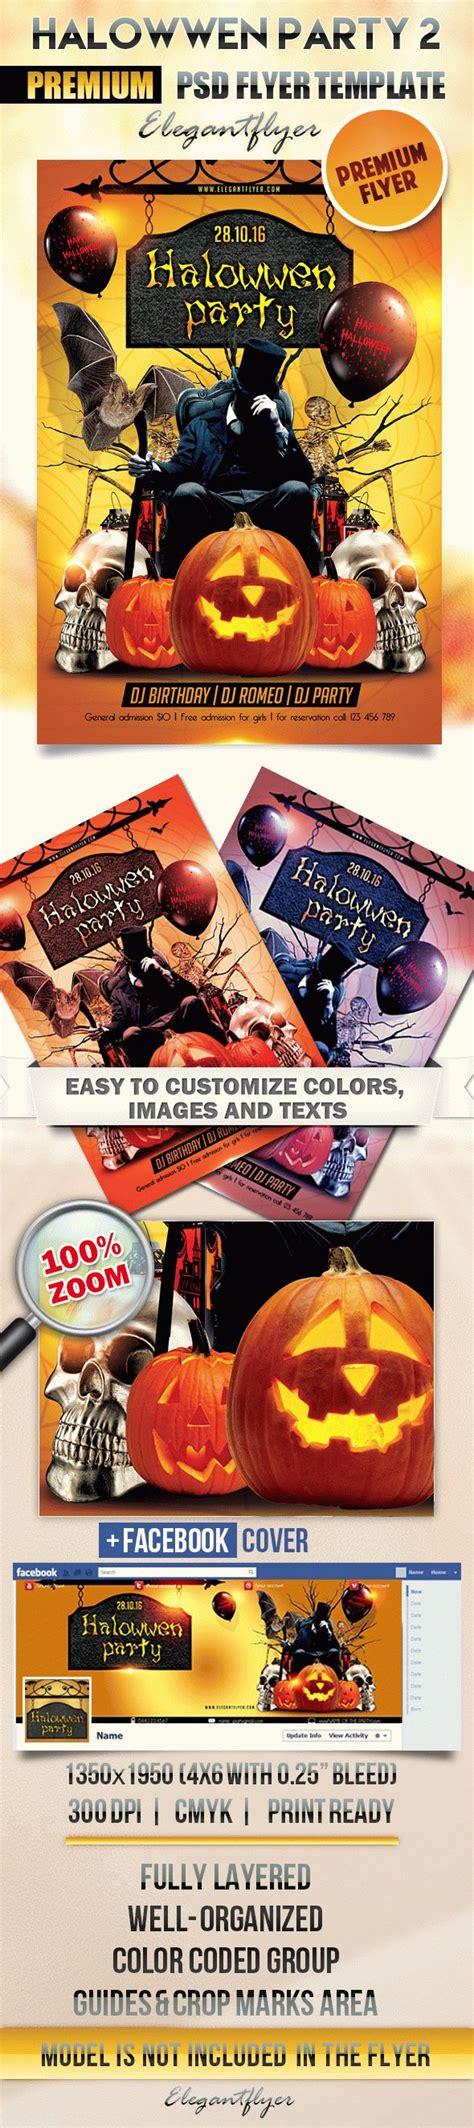 Halloween Party 2 Flyer Psd Template Facebook Cover By Elegantflyer Flyer Template Psd 2